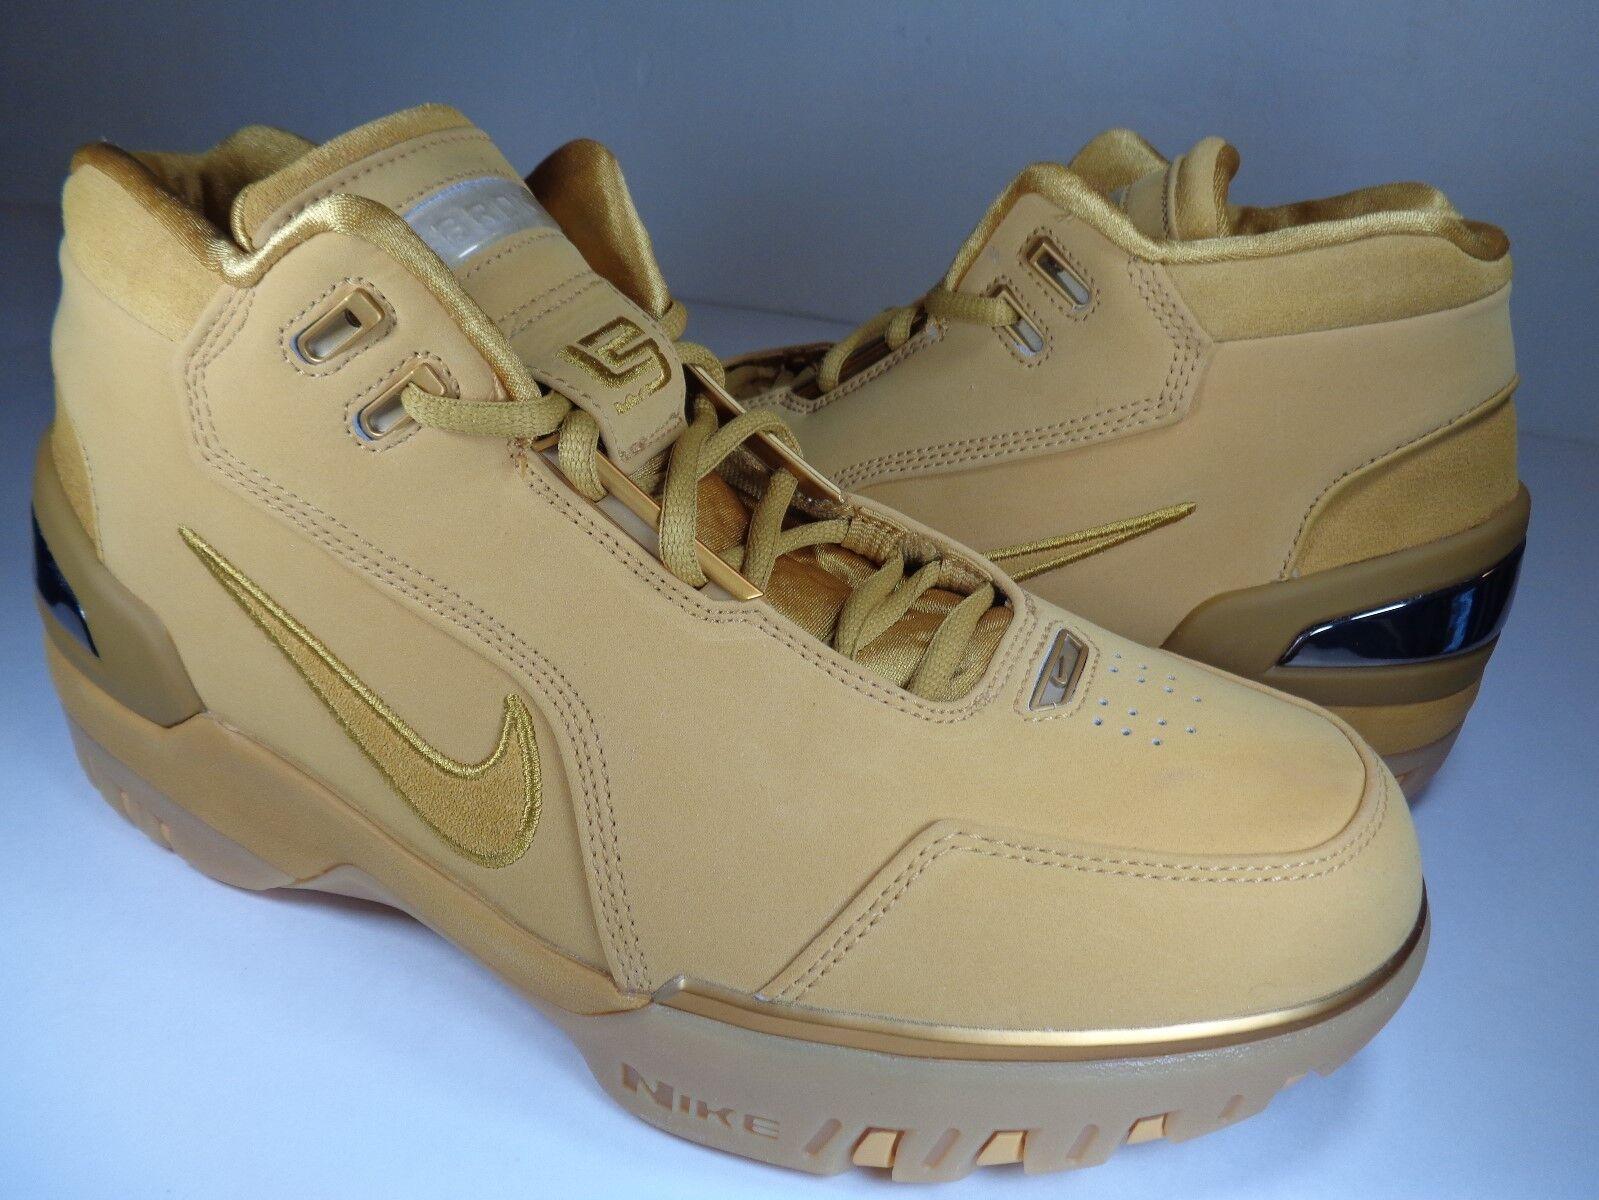 Nike air zoom generation retro retro generation - asg - lebron 1 gold sz 9,5 (aq0110-700) 8e4d99